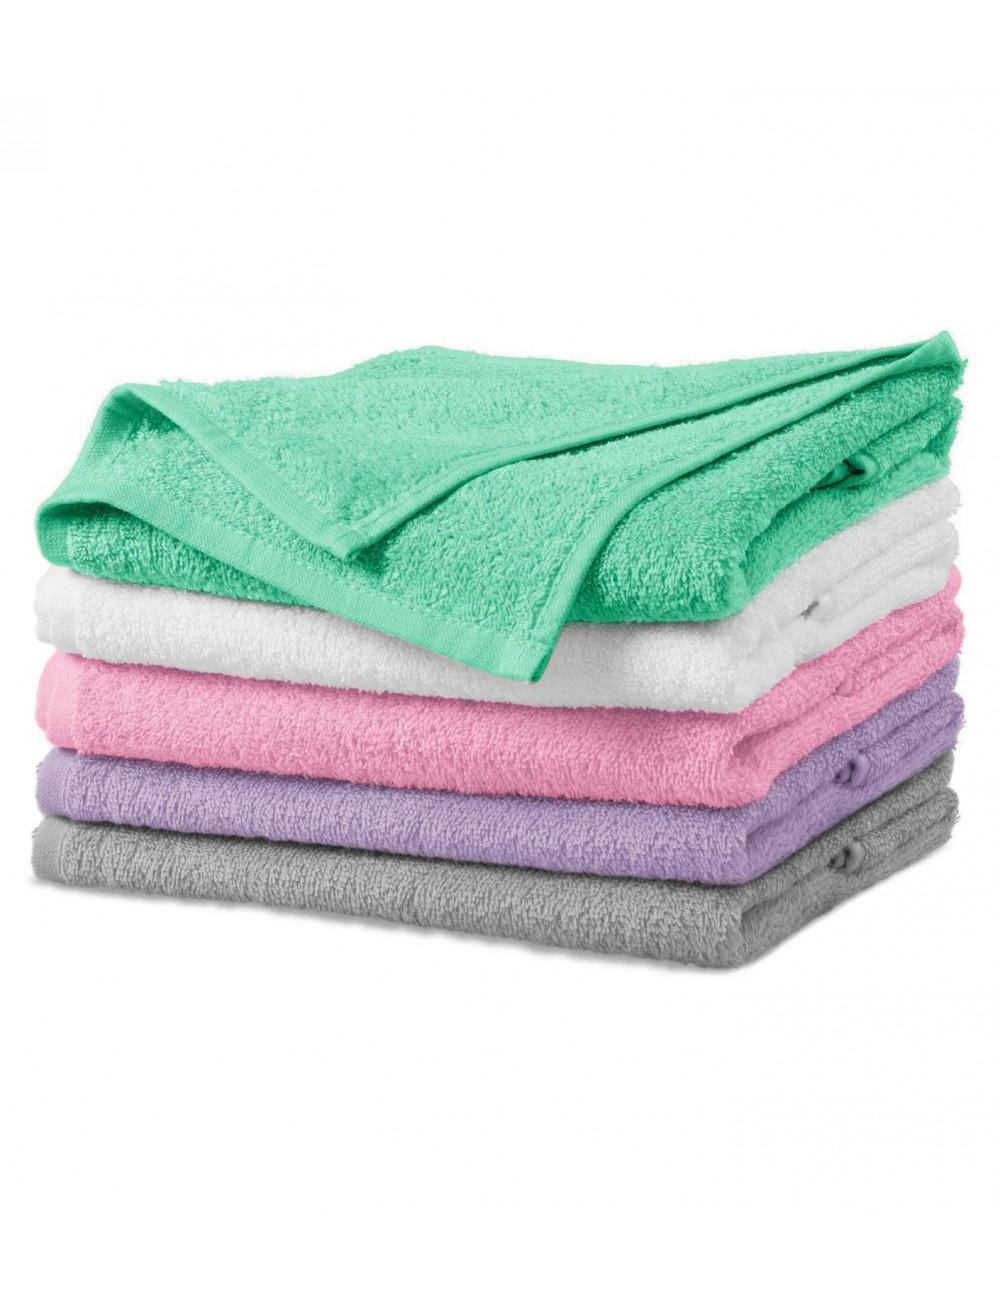 Adler MALFINI Ręcznik unisex Terry Towel 908 lawendowy